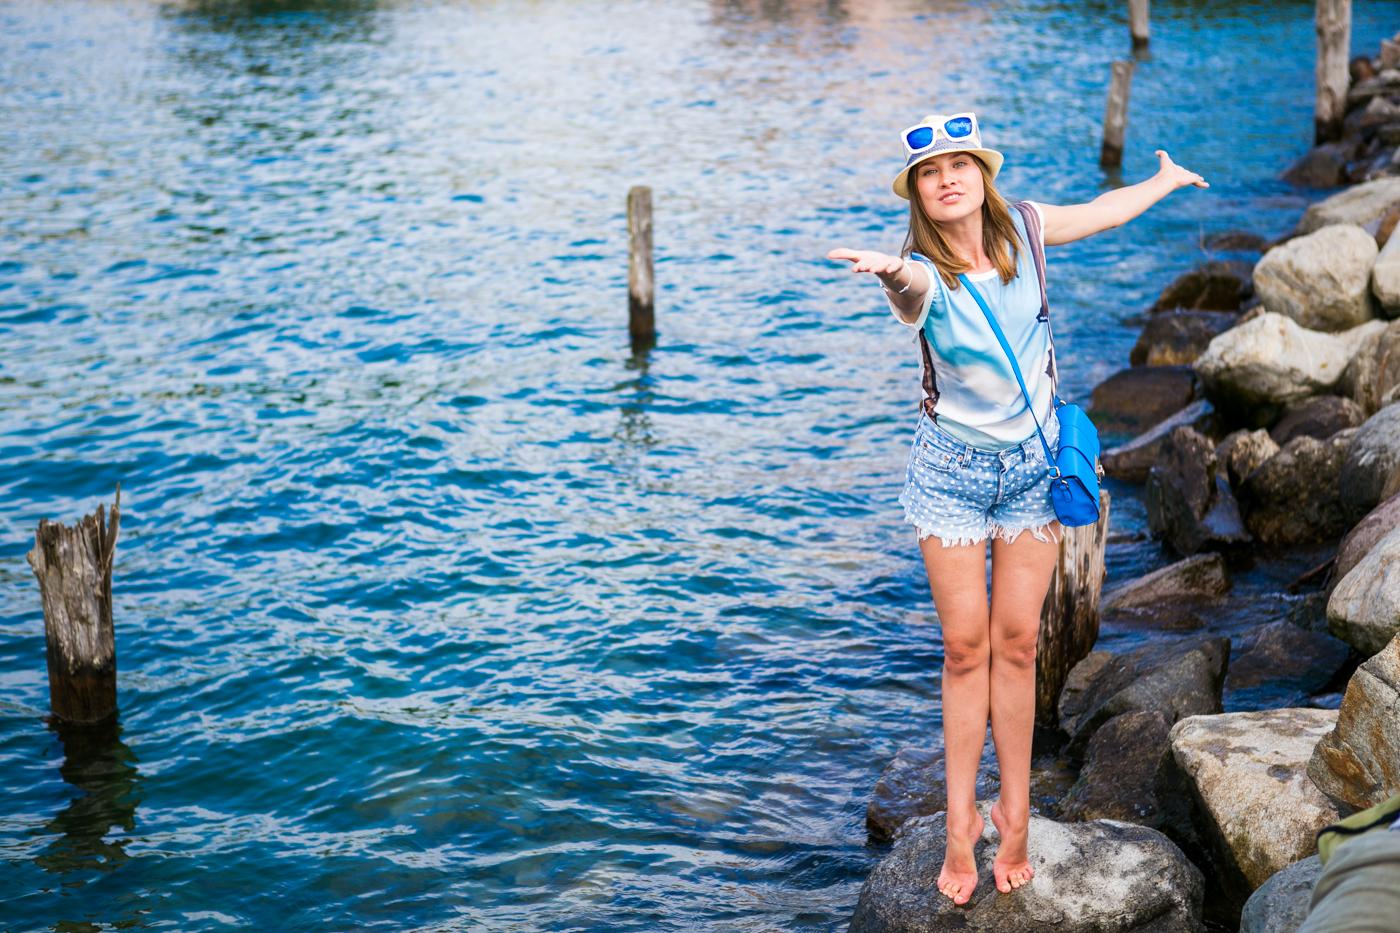 thecablook darya kamalova fashion blog street style denim shorts ash booties hm hat iseo lake piramidi di zona brescia-100